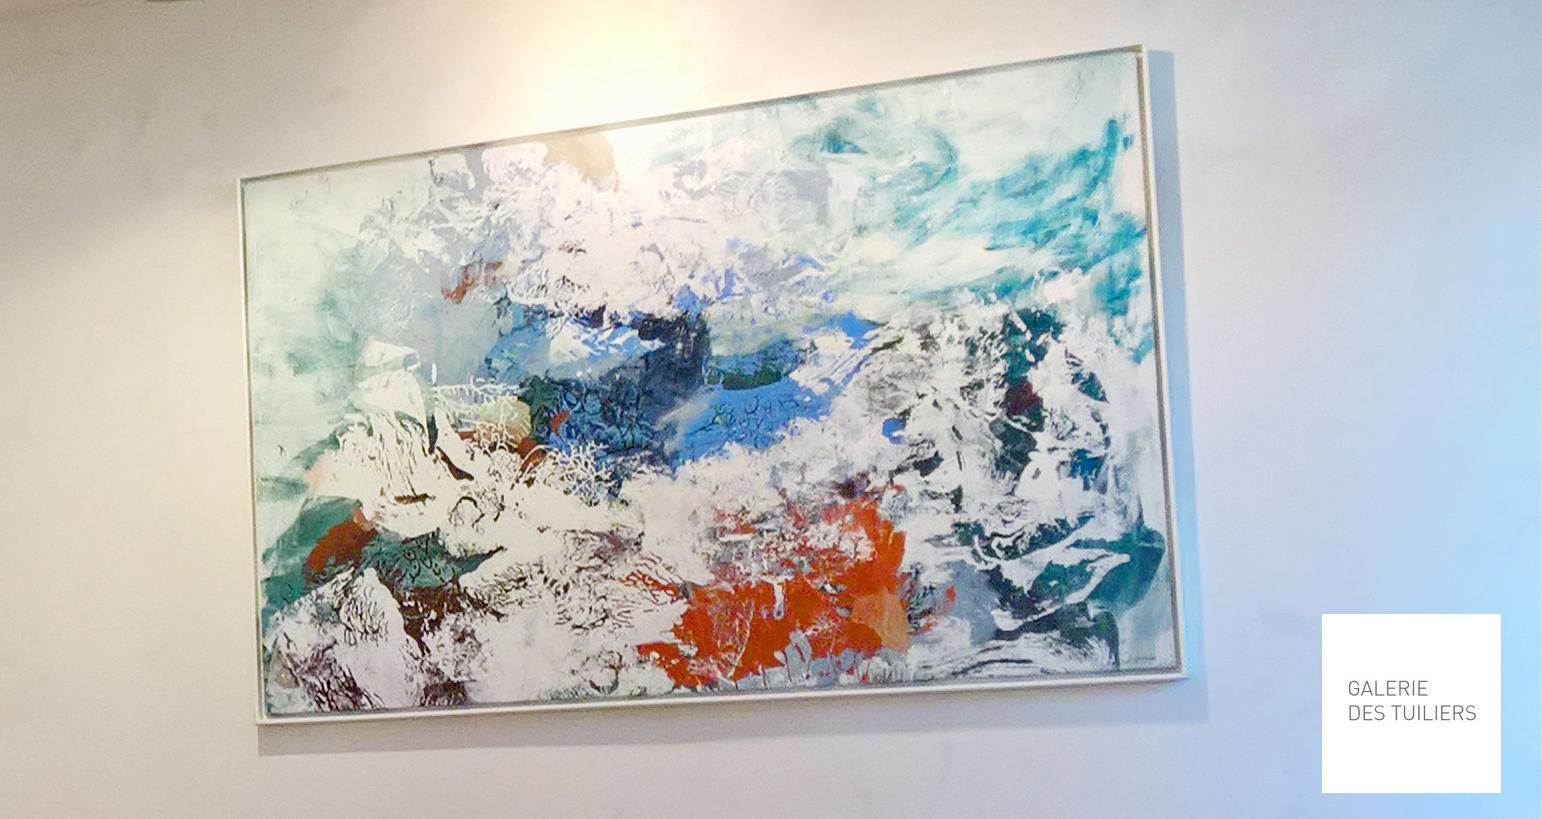 amelie-ducommun-galeriedestuiliers-2017 (3)